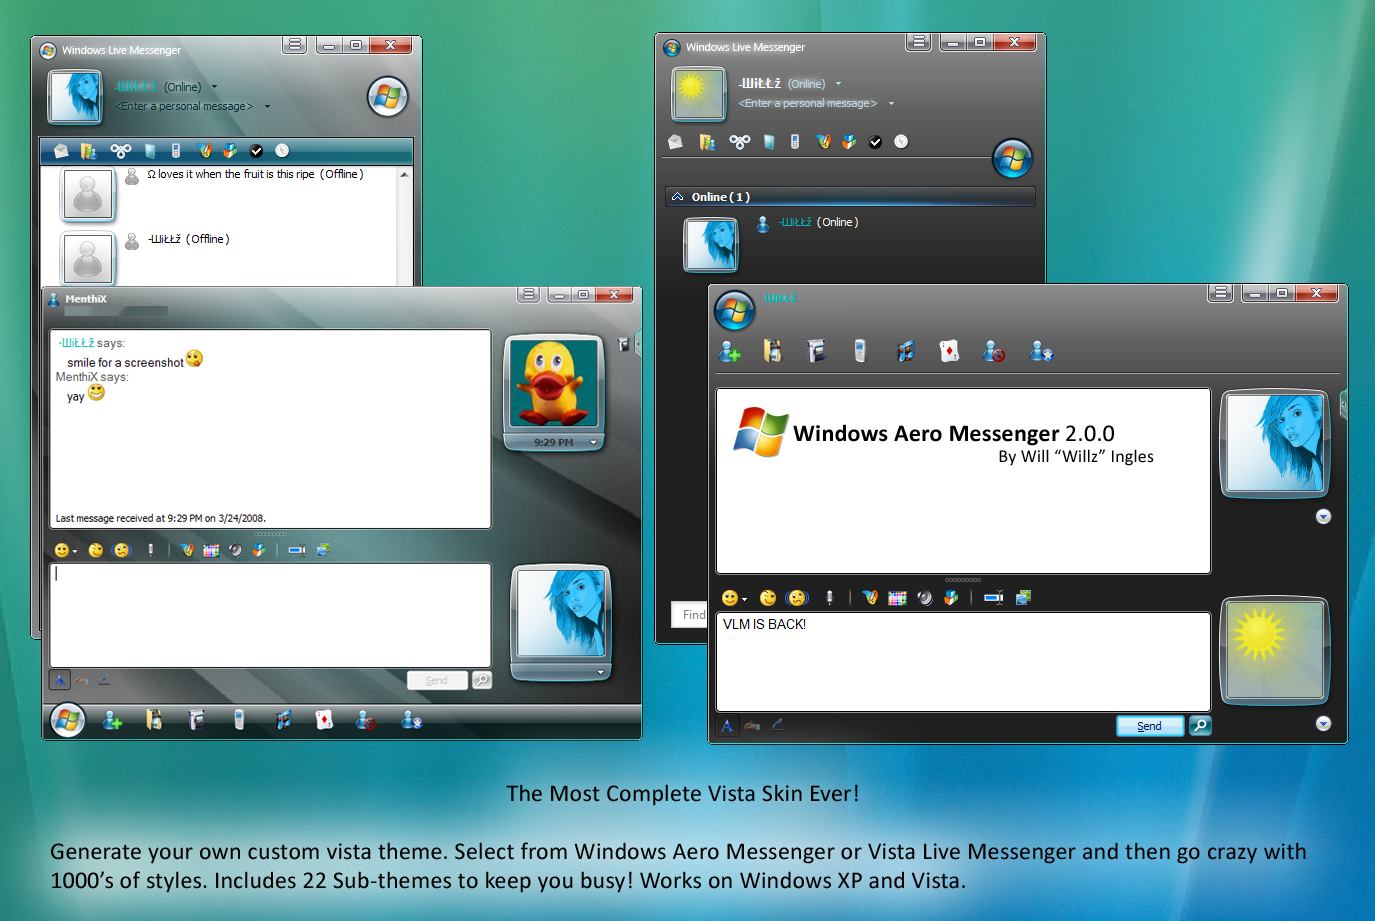 windows aero messenger 2.0.2